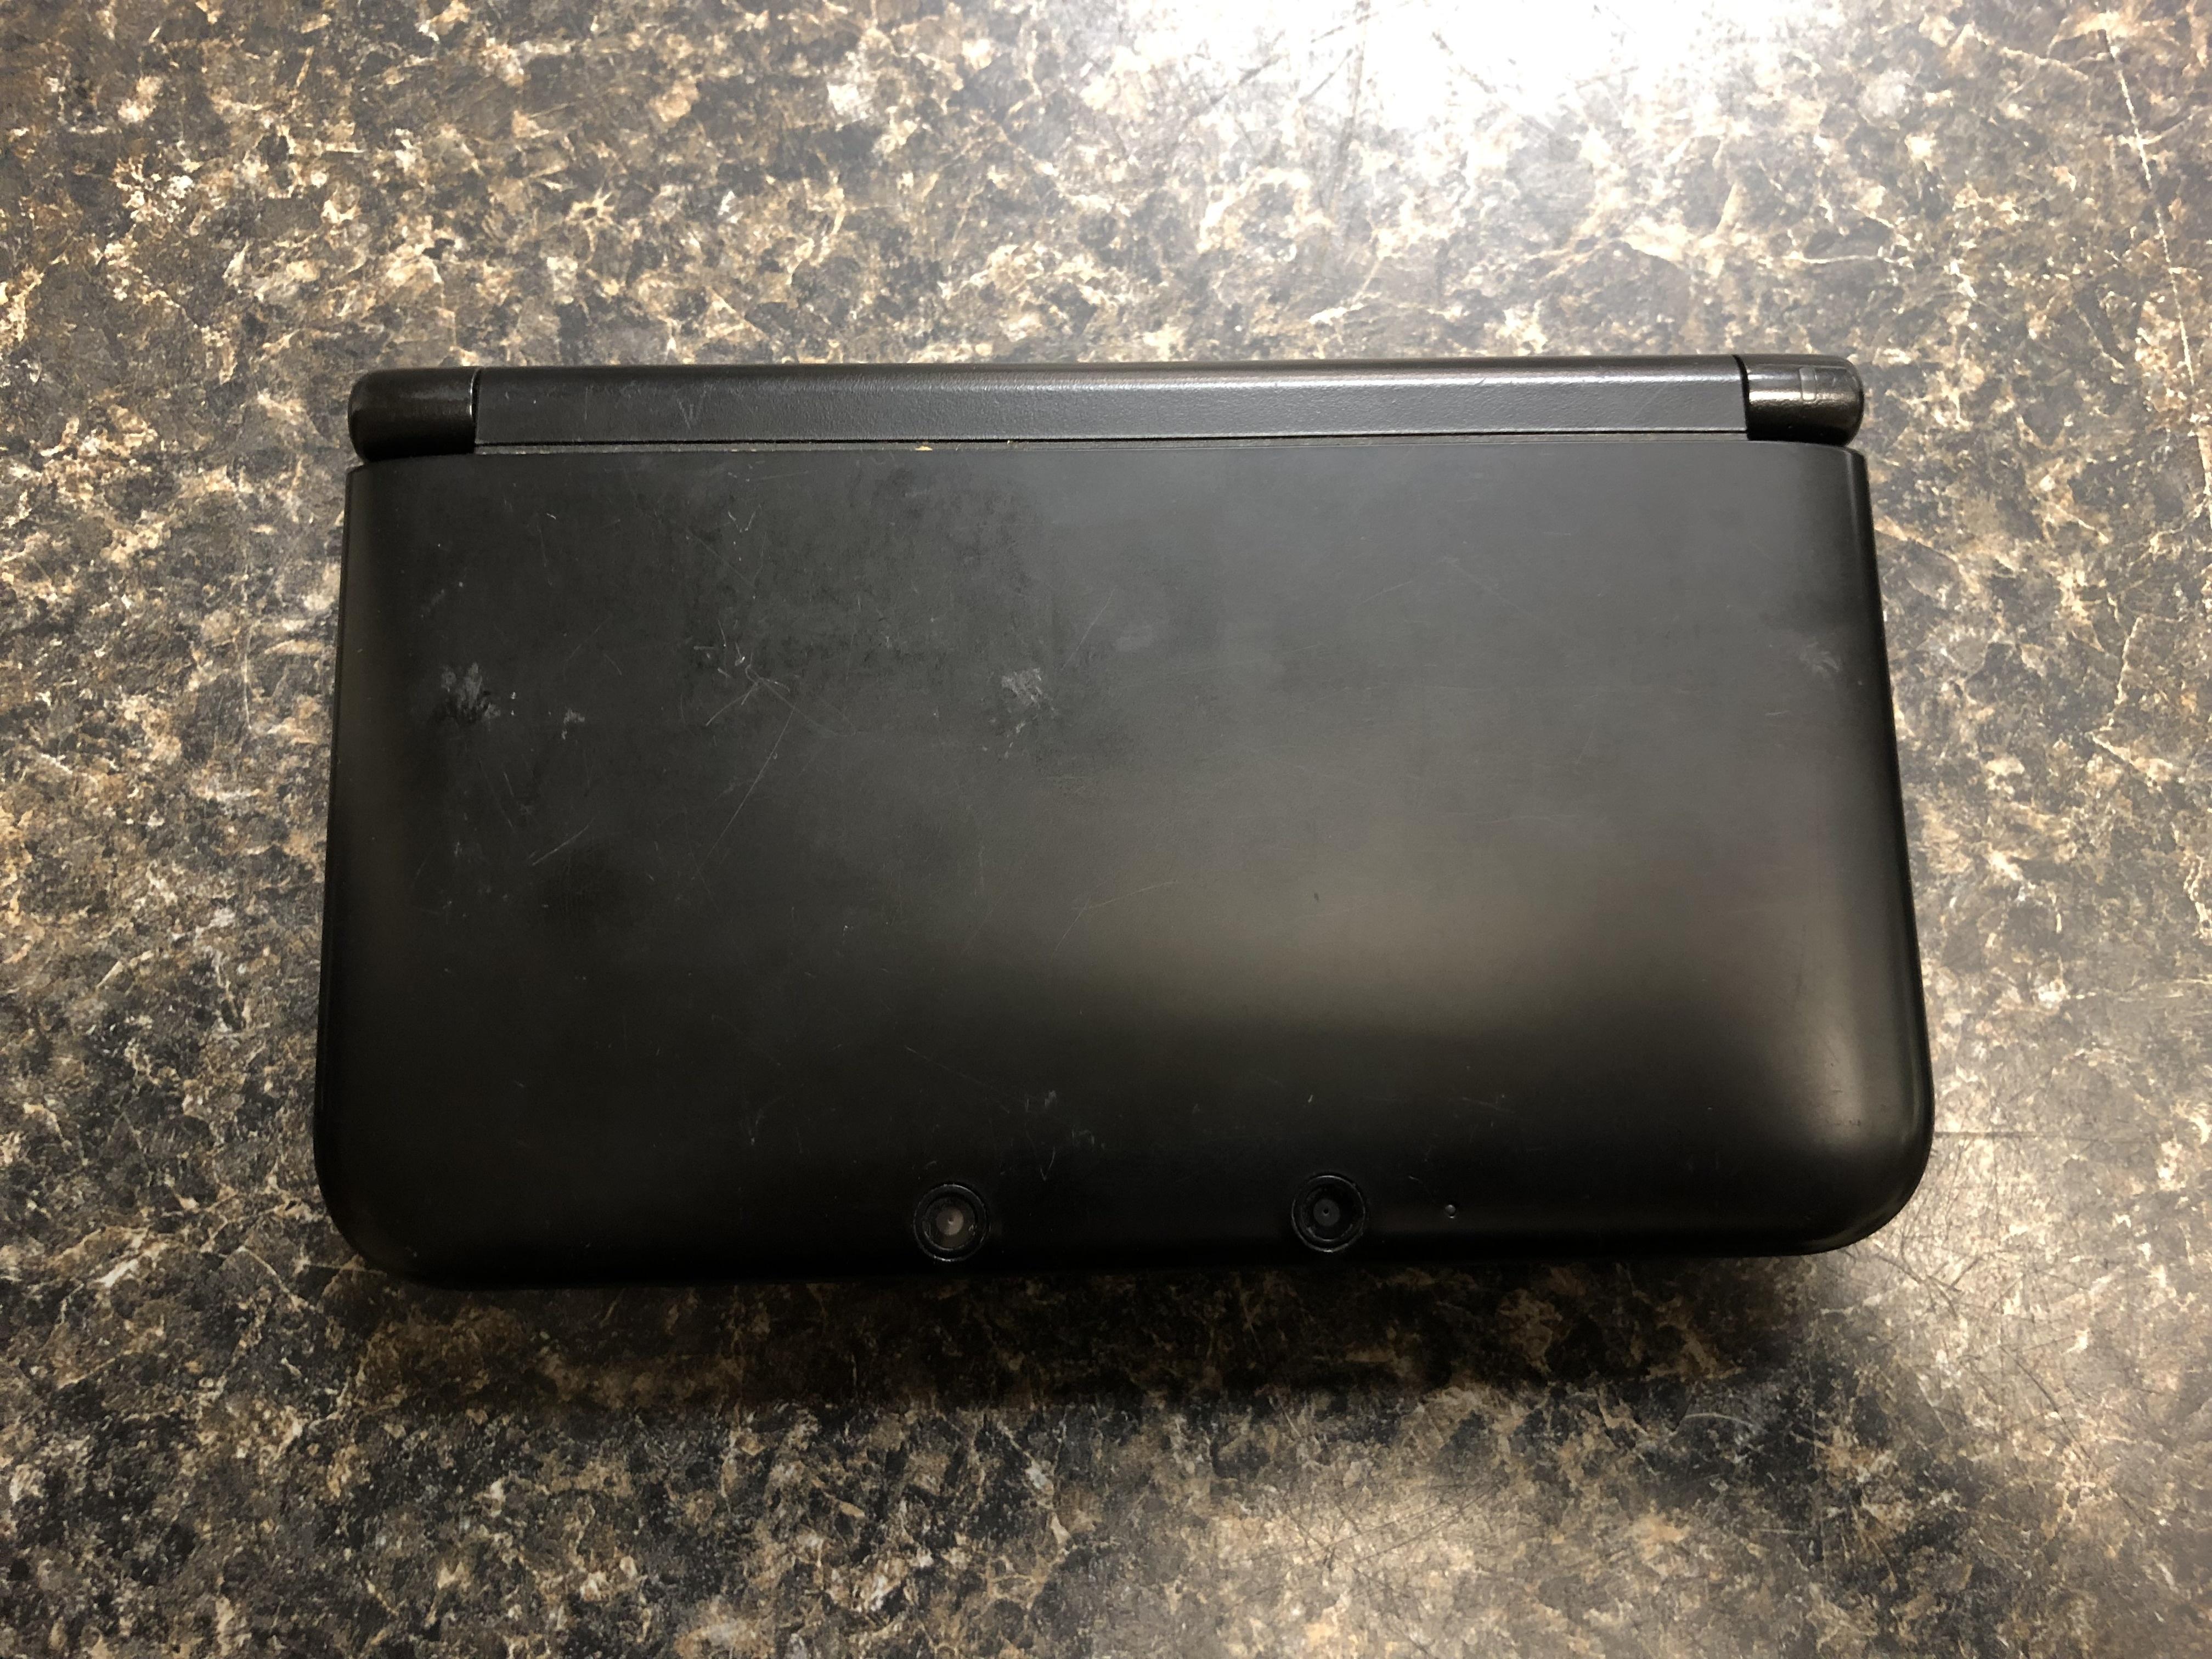 BLACK NINTENDO 3DS - SPR-001